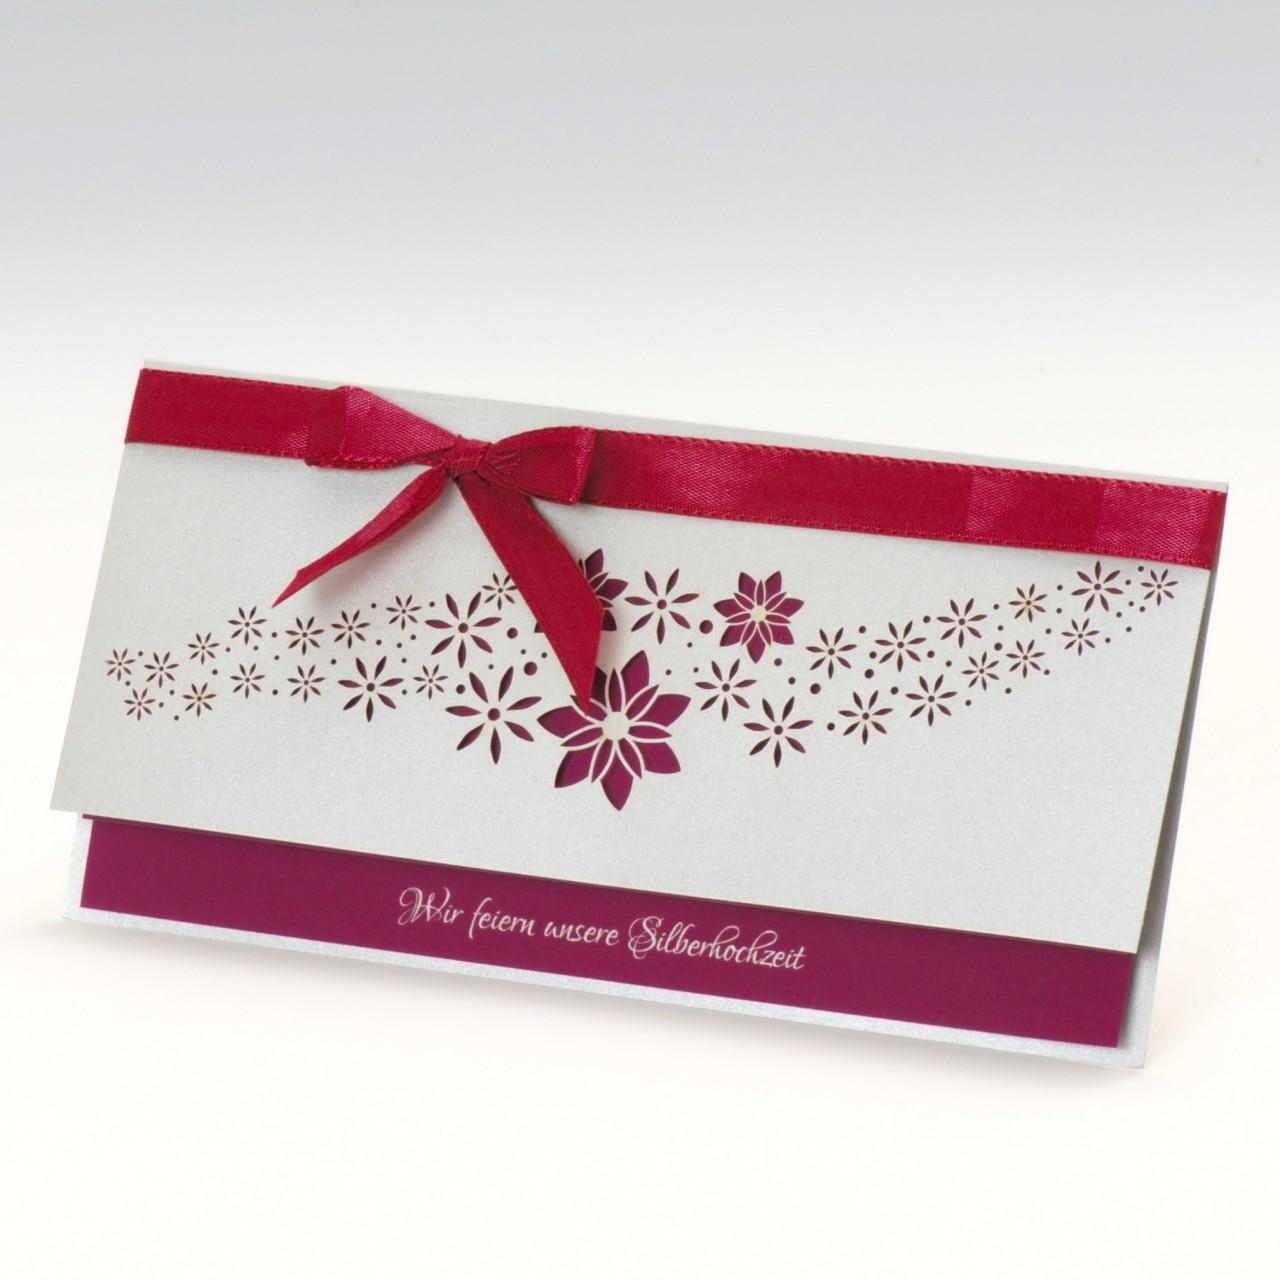 Einladungskarte - A 2104